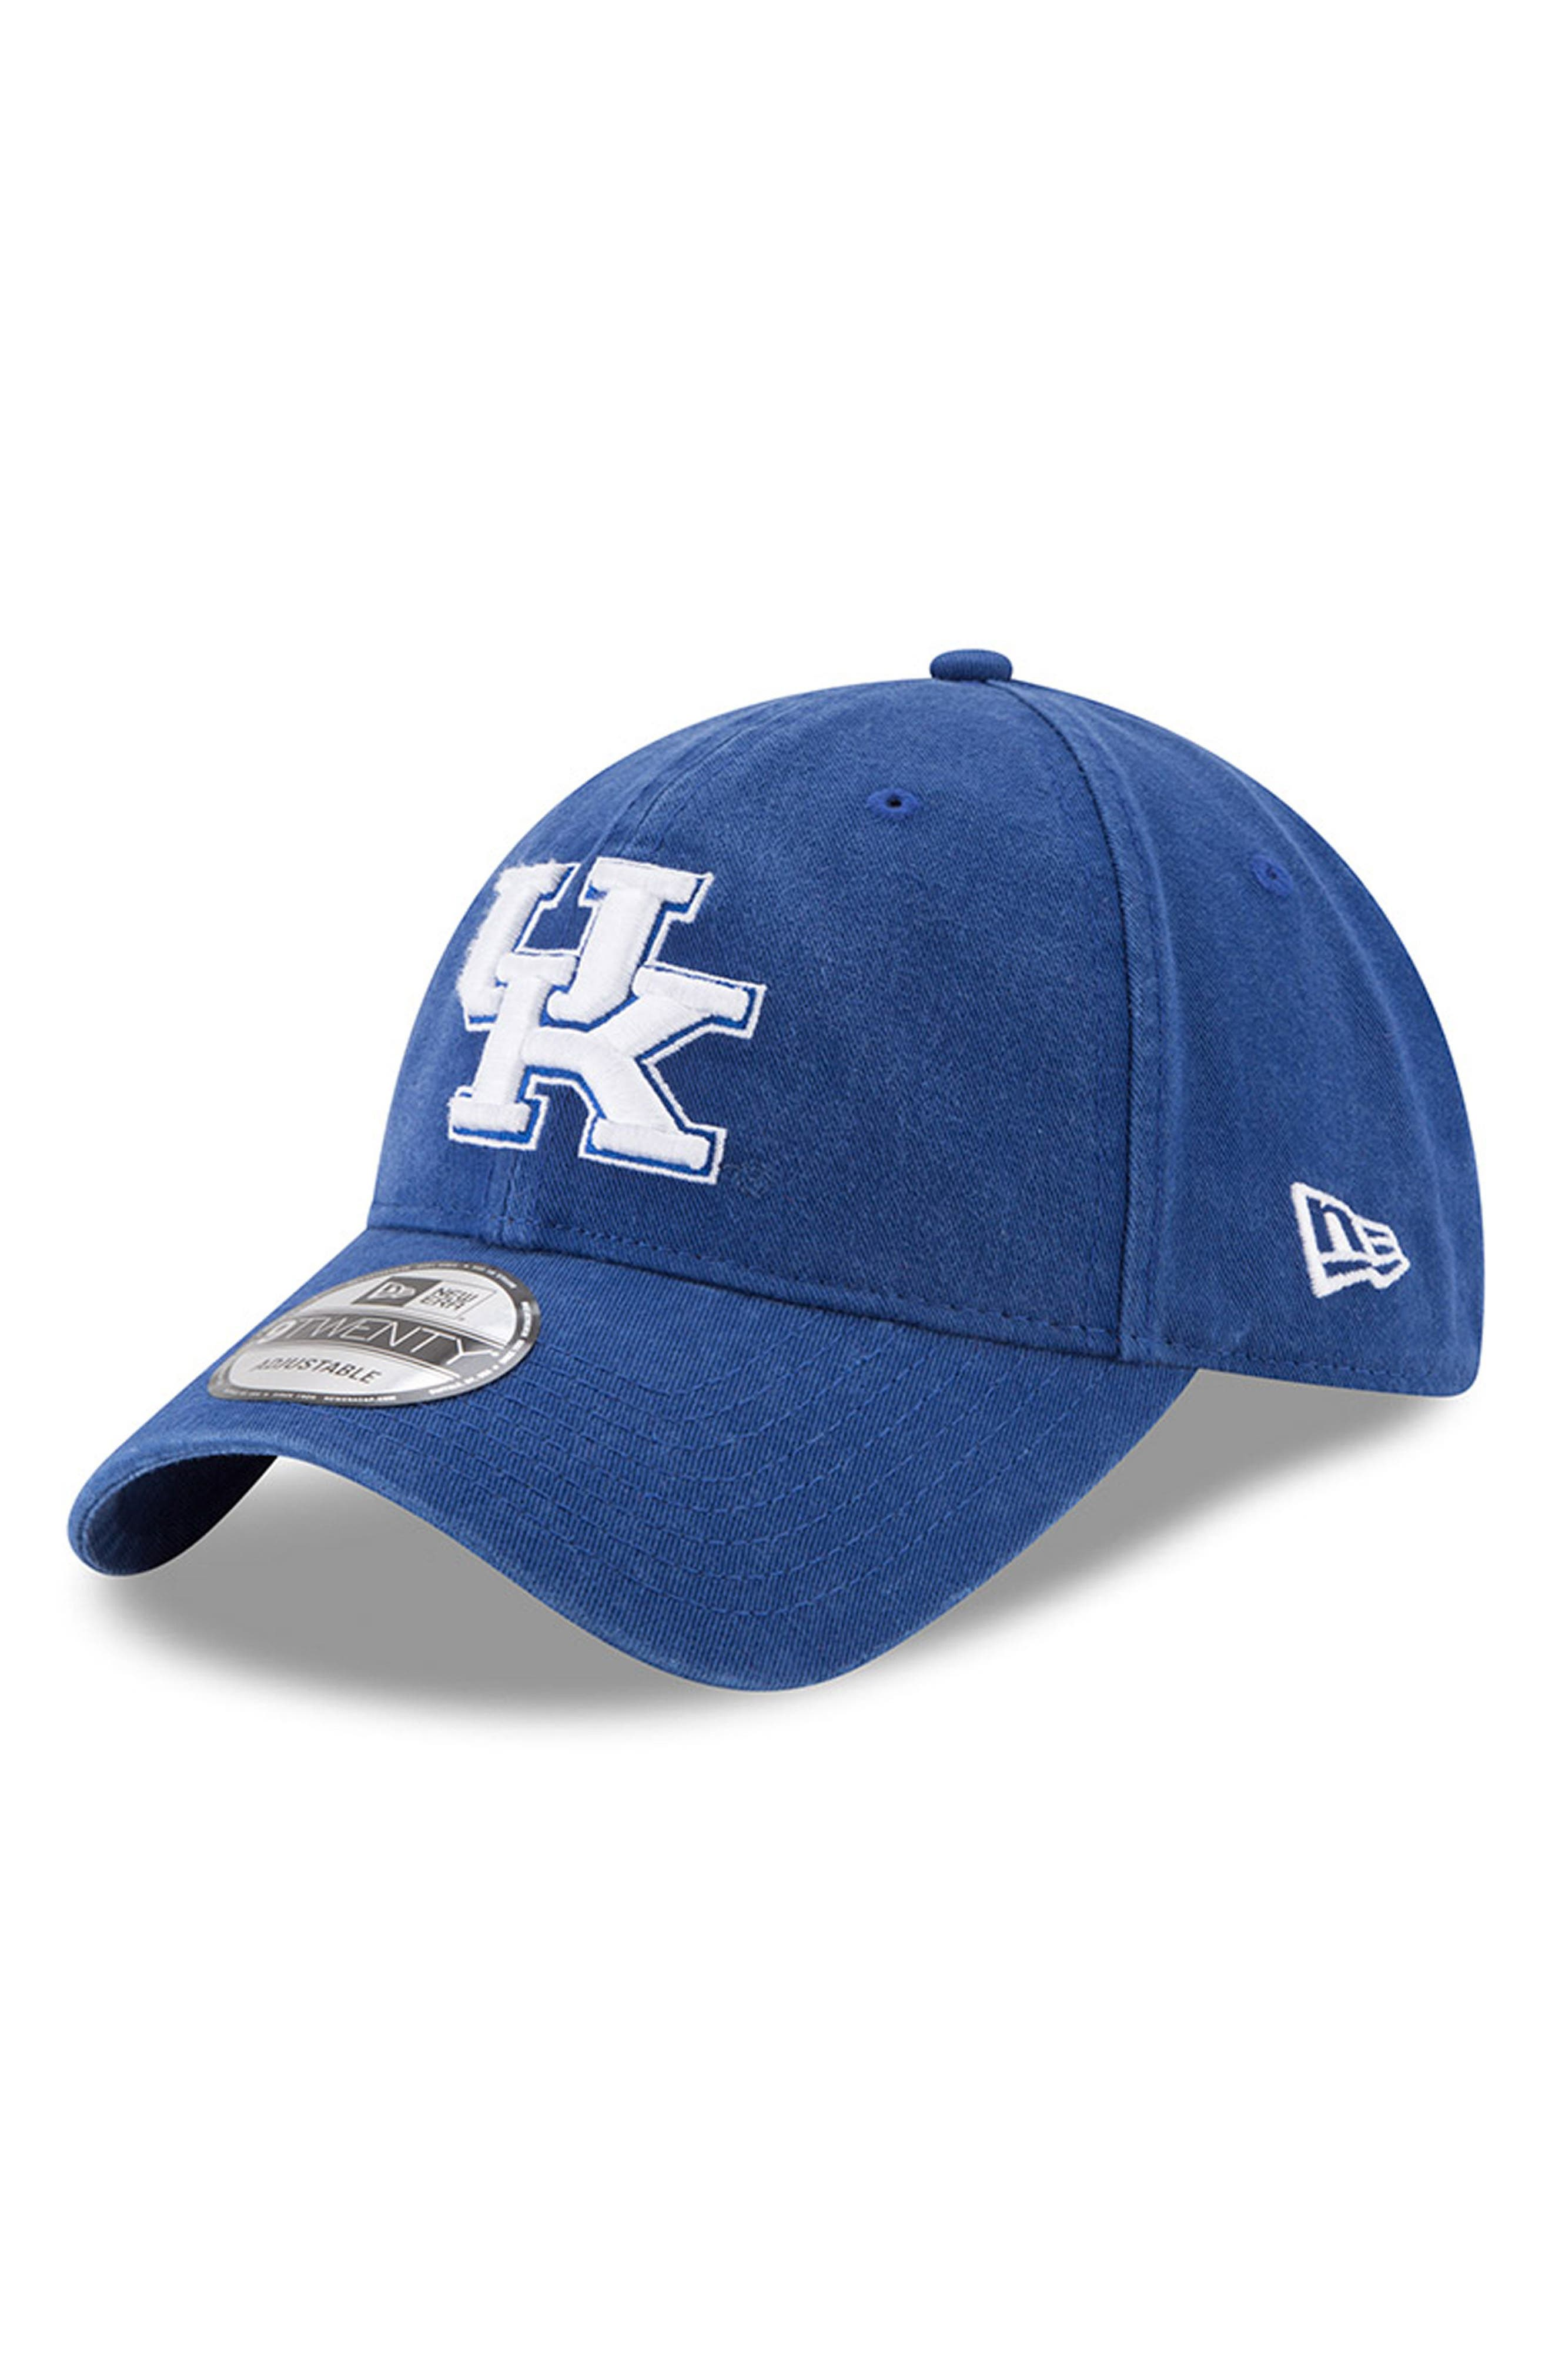 New Era Collegiate Core Classic - Kentucky Wildcats Baseball Cap,                             Main thumbnail 1, color,